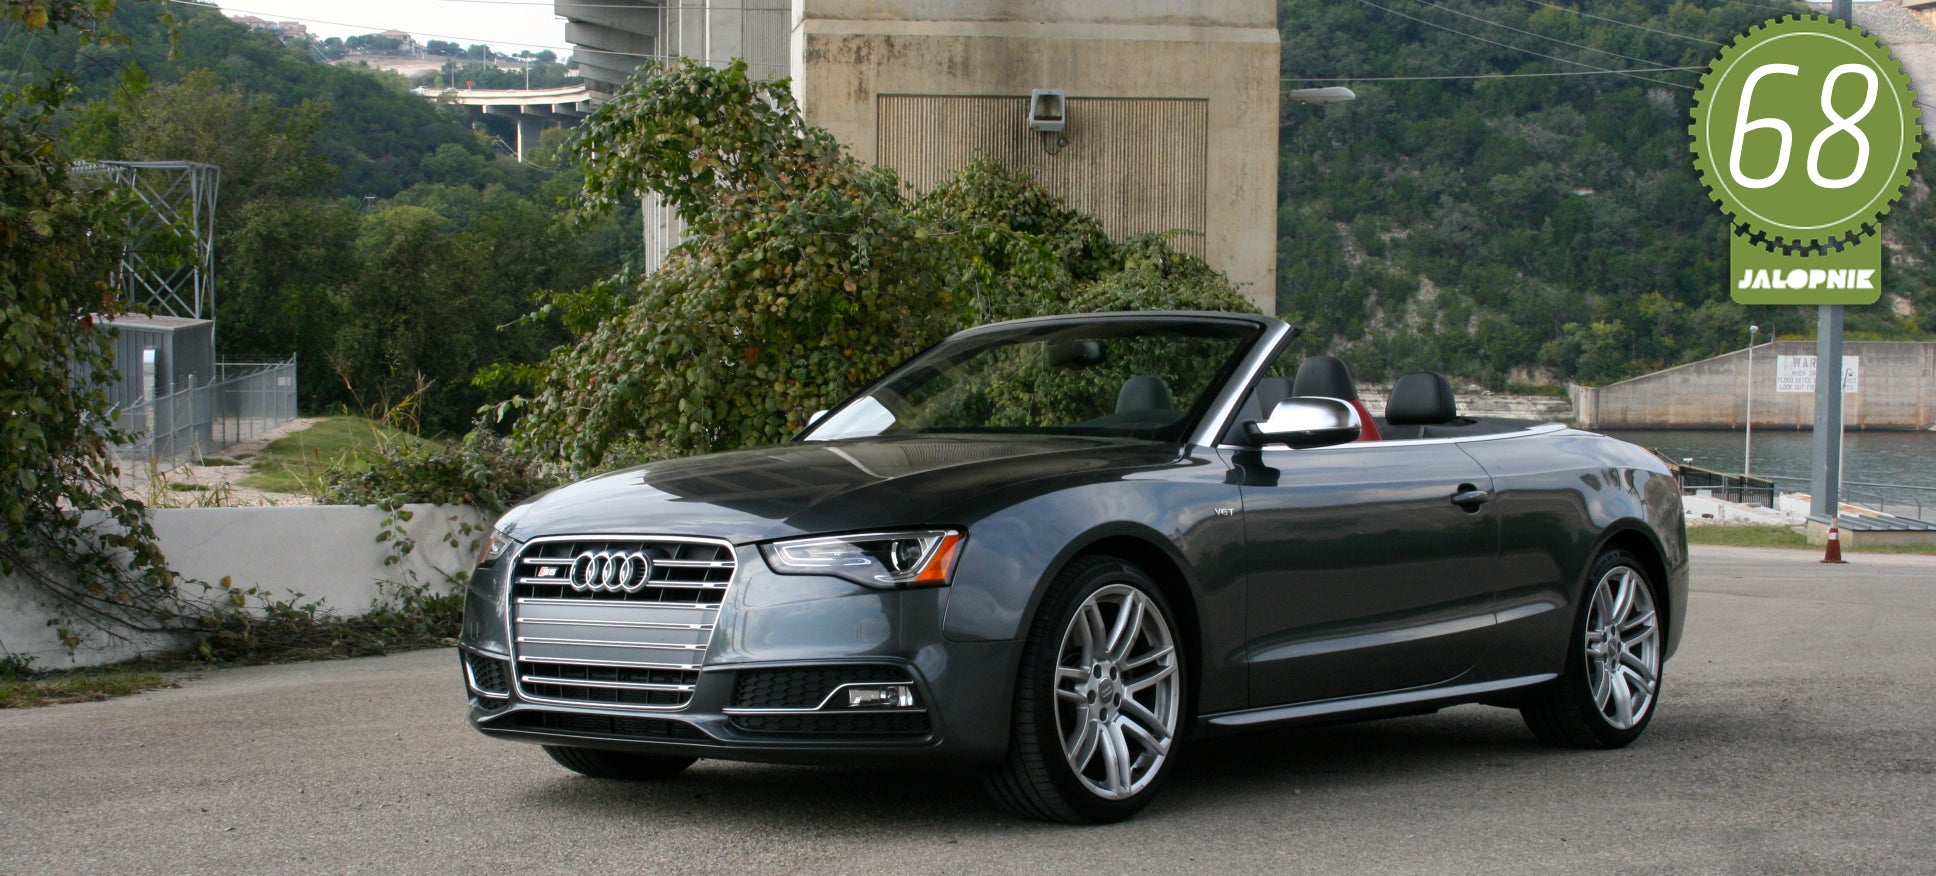 2015 audi s5 cabriolet the jalopnik review rh jalopnik com Blue Audi S5 Convertible audi s5 cabriolet manual transmission